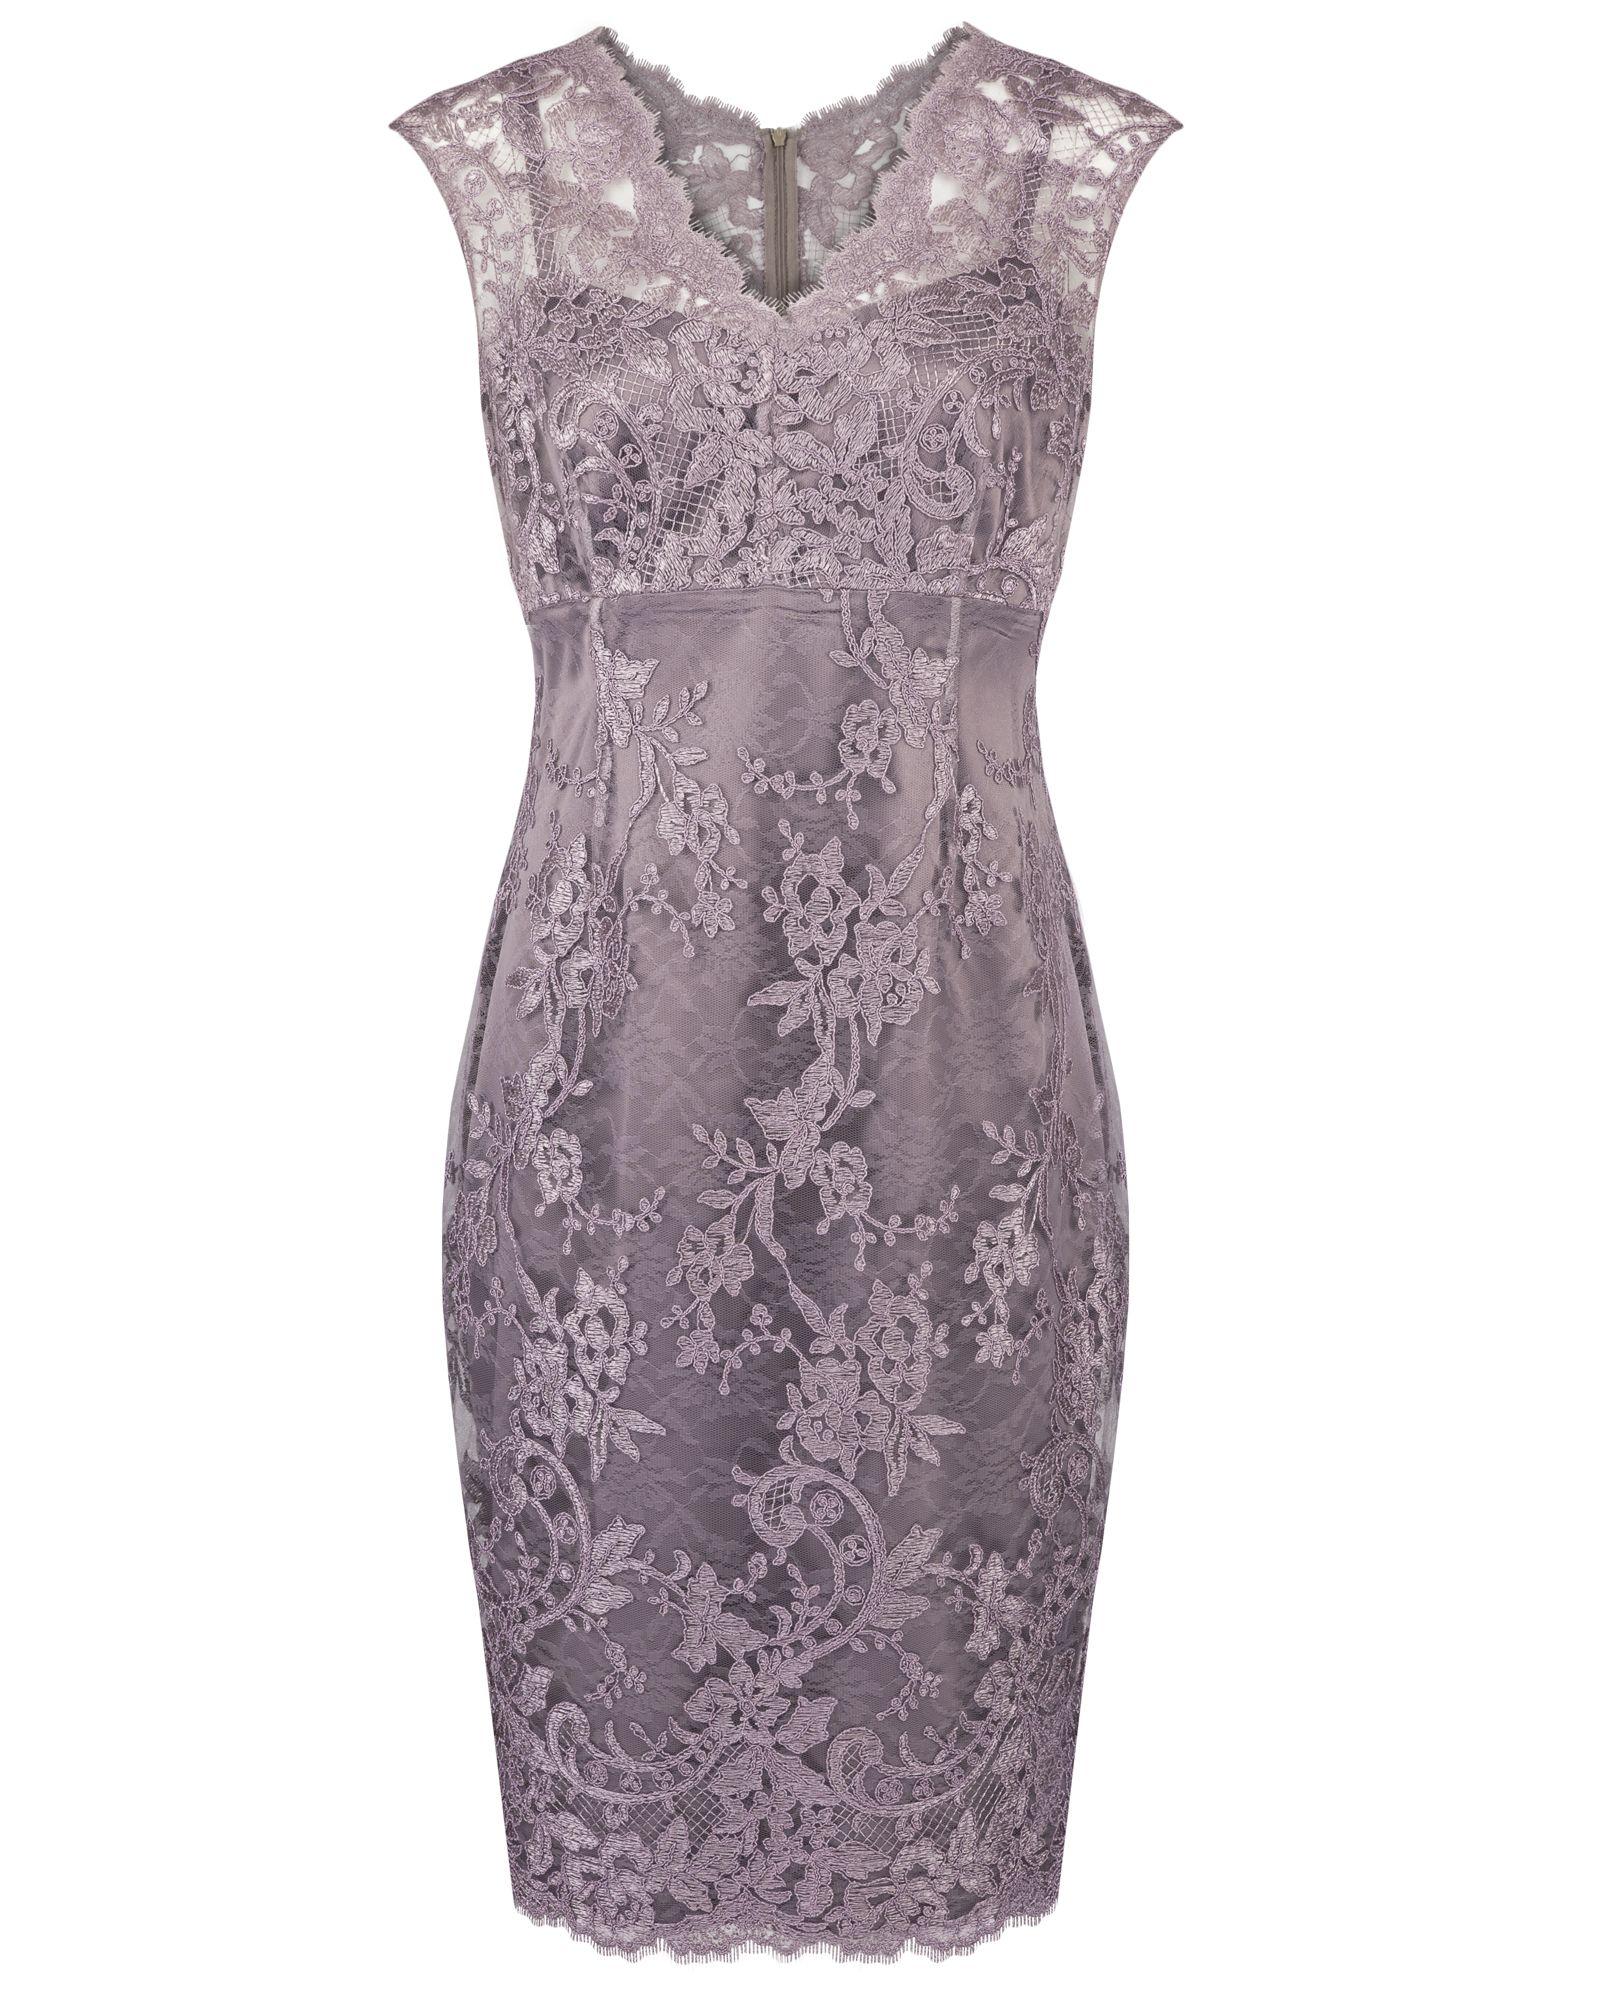 Grey wedding guest dress  Musk Corded Lace Dress Image   ChrisP  Pinterest  Dress images